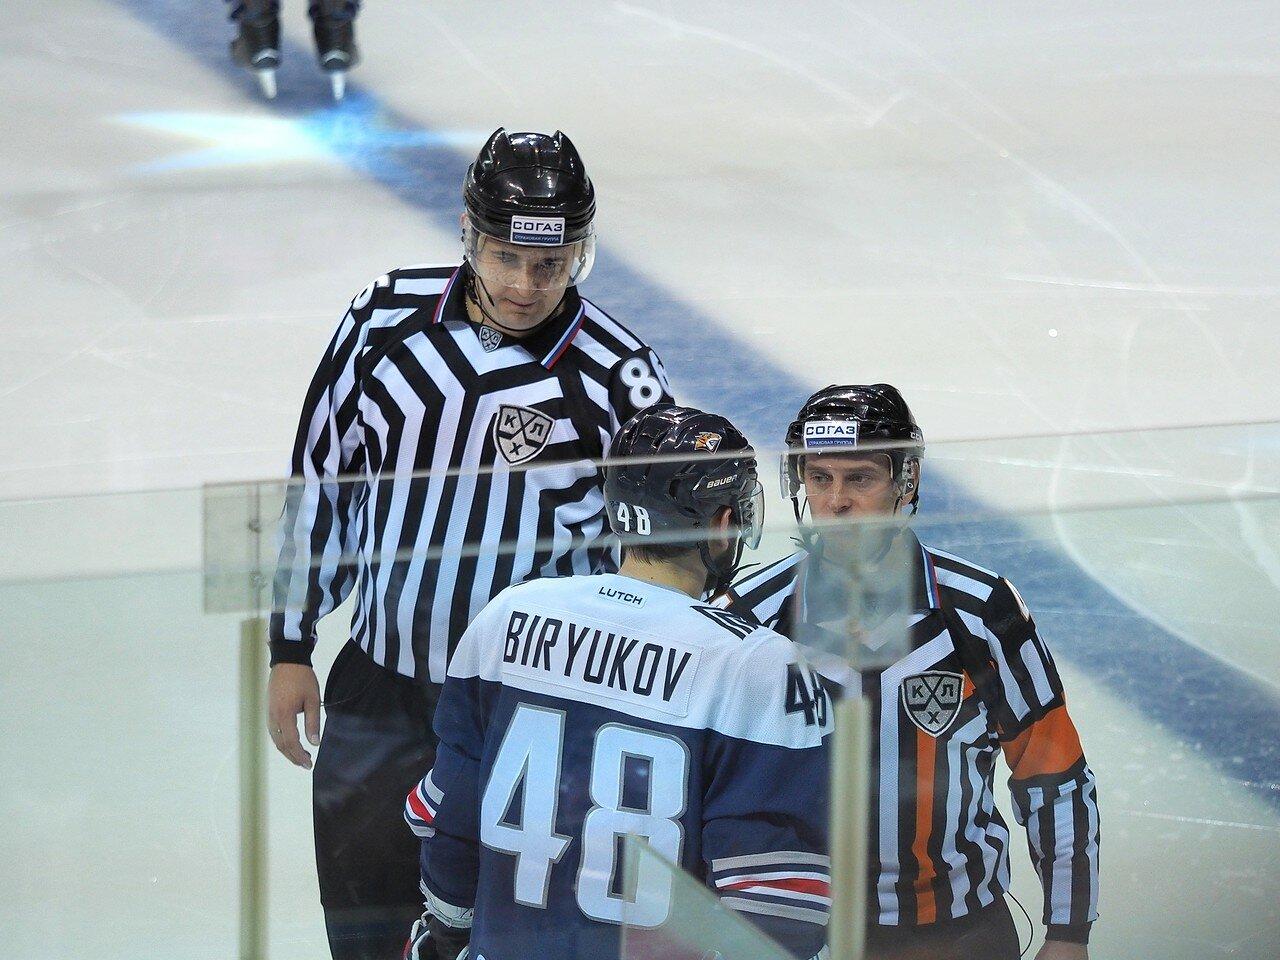 47Плей-офф 2016 Восток Финал Металлург - Салават Юлаев 25.03.2016